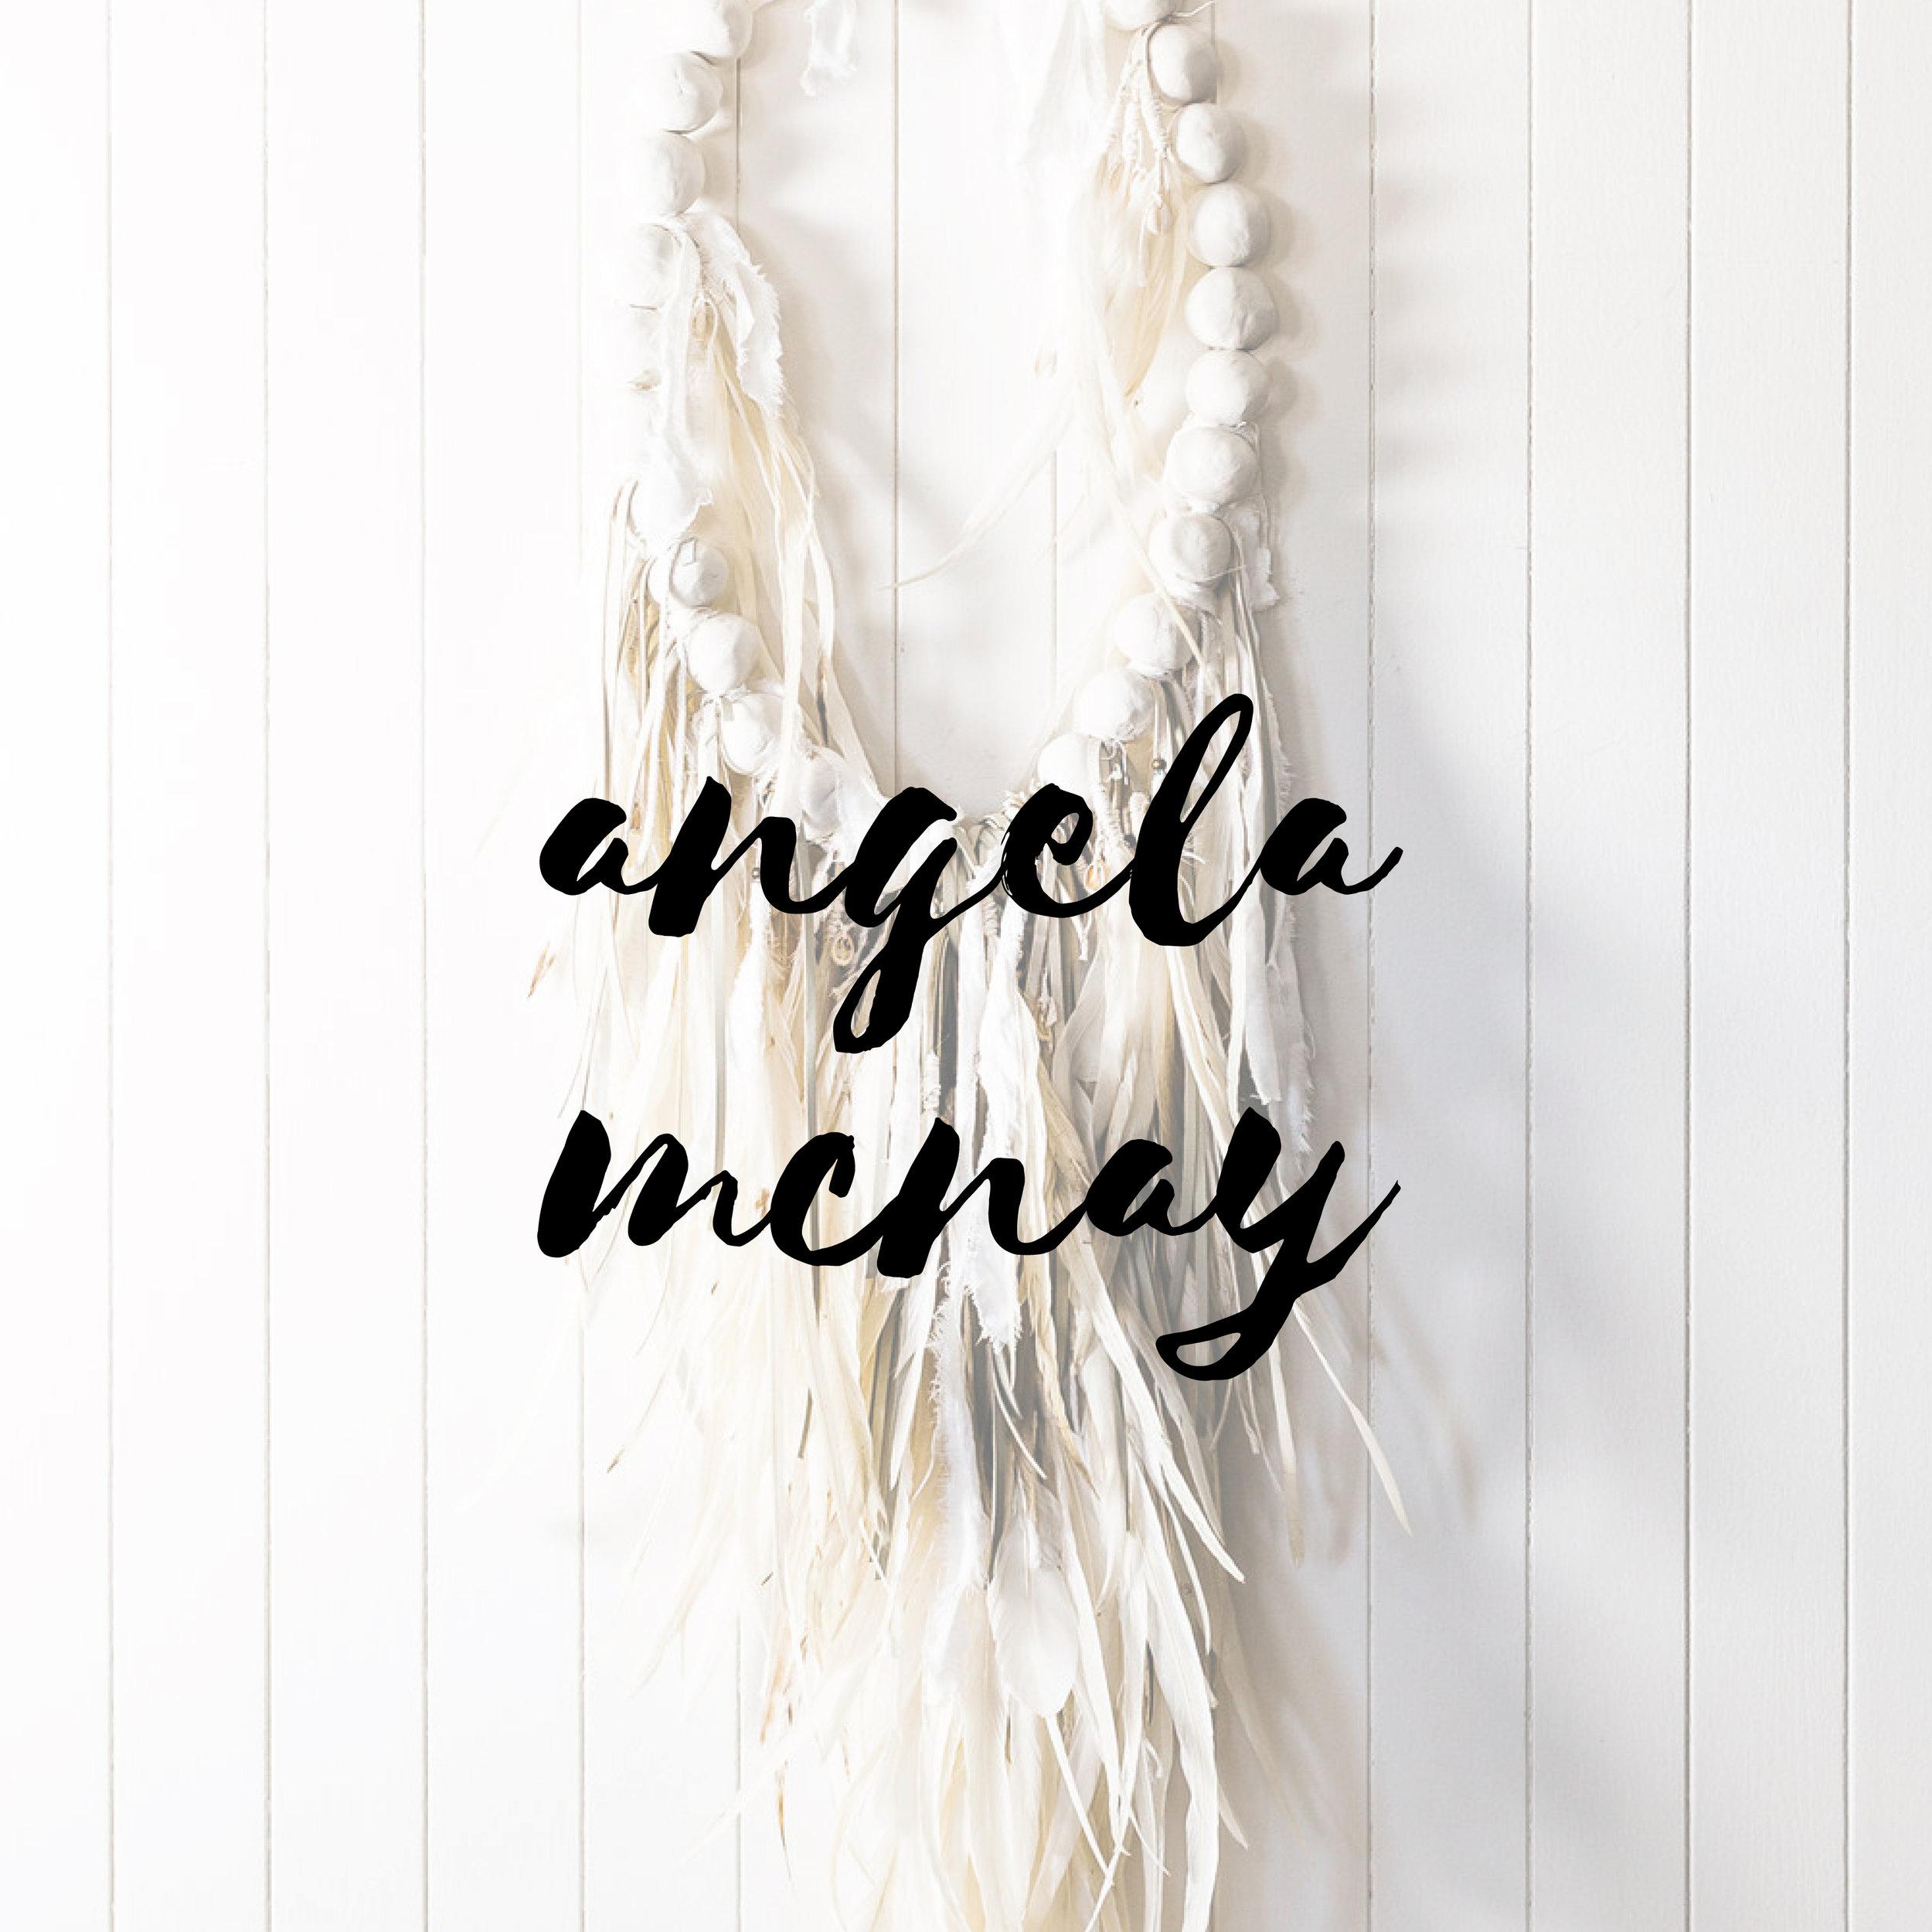 Angela Mcnay.jpg